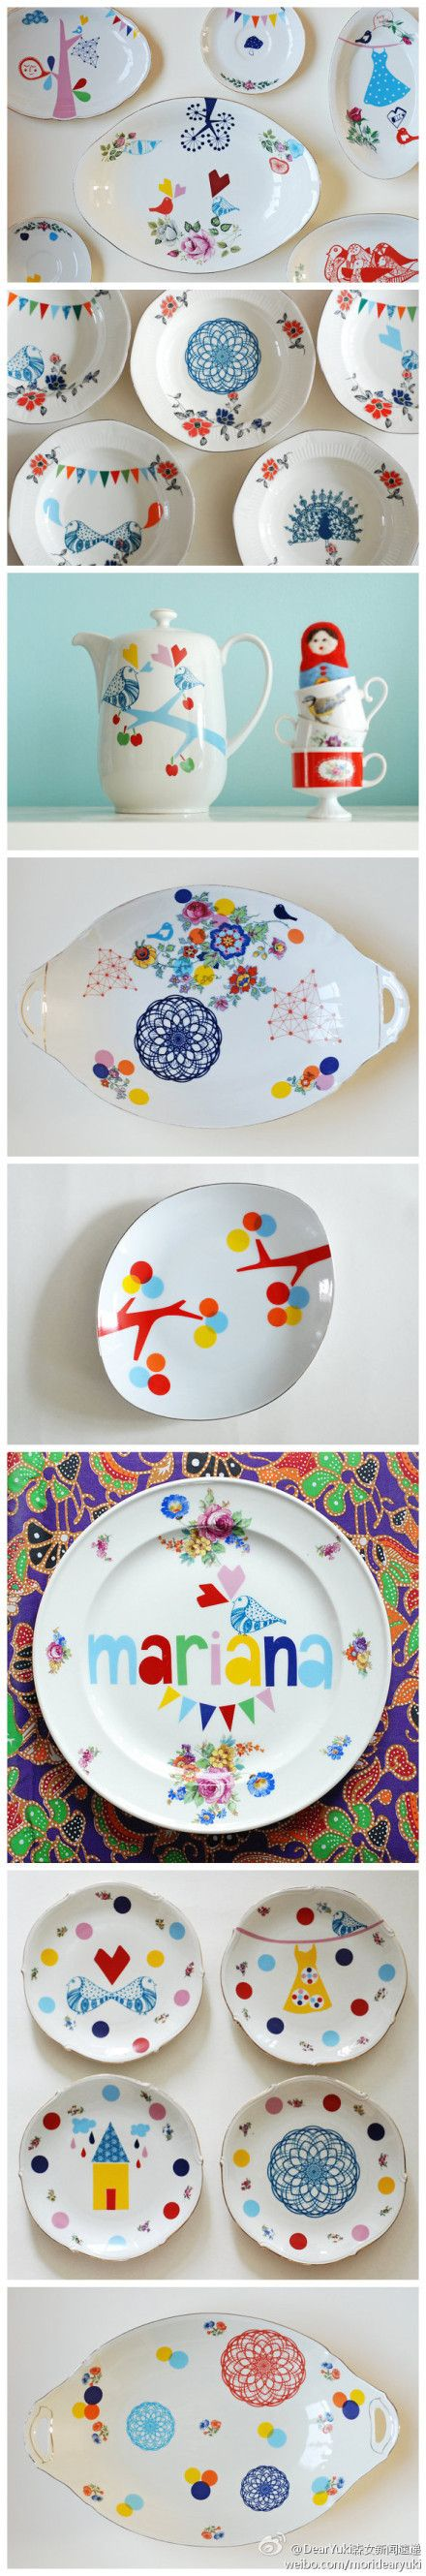 the silence of art  #ceramic